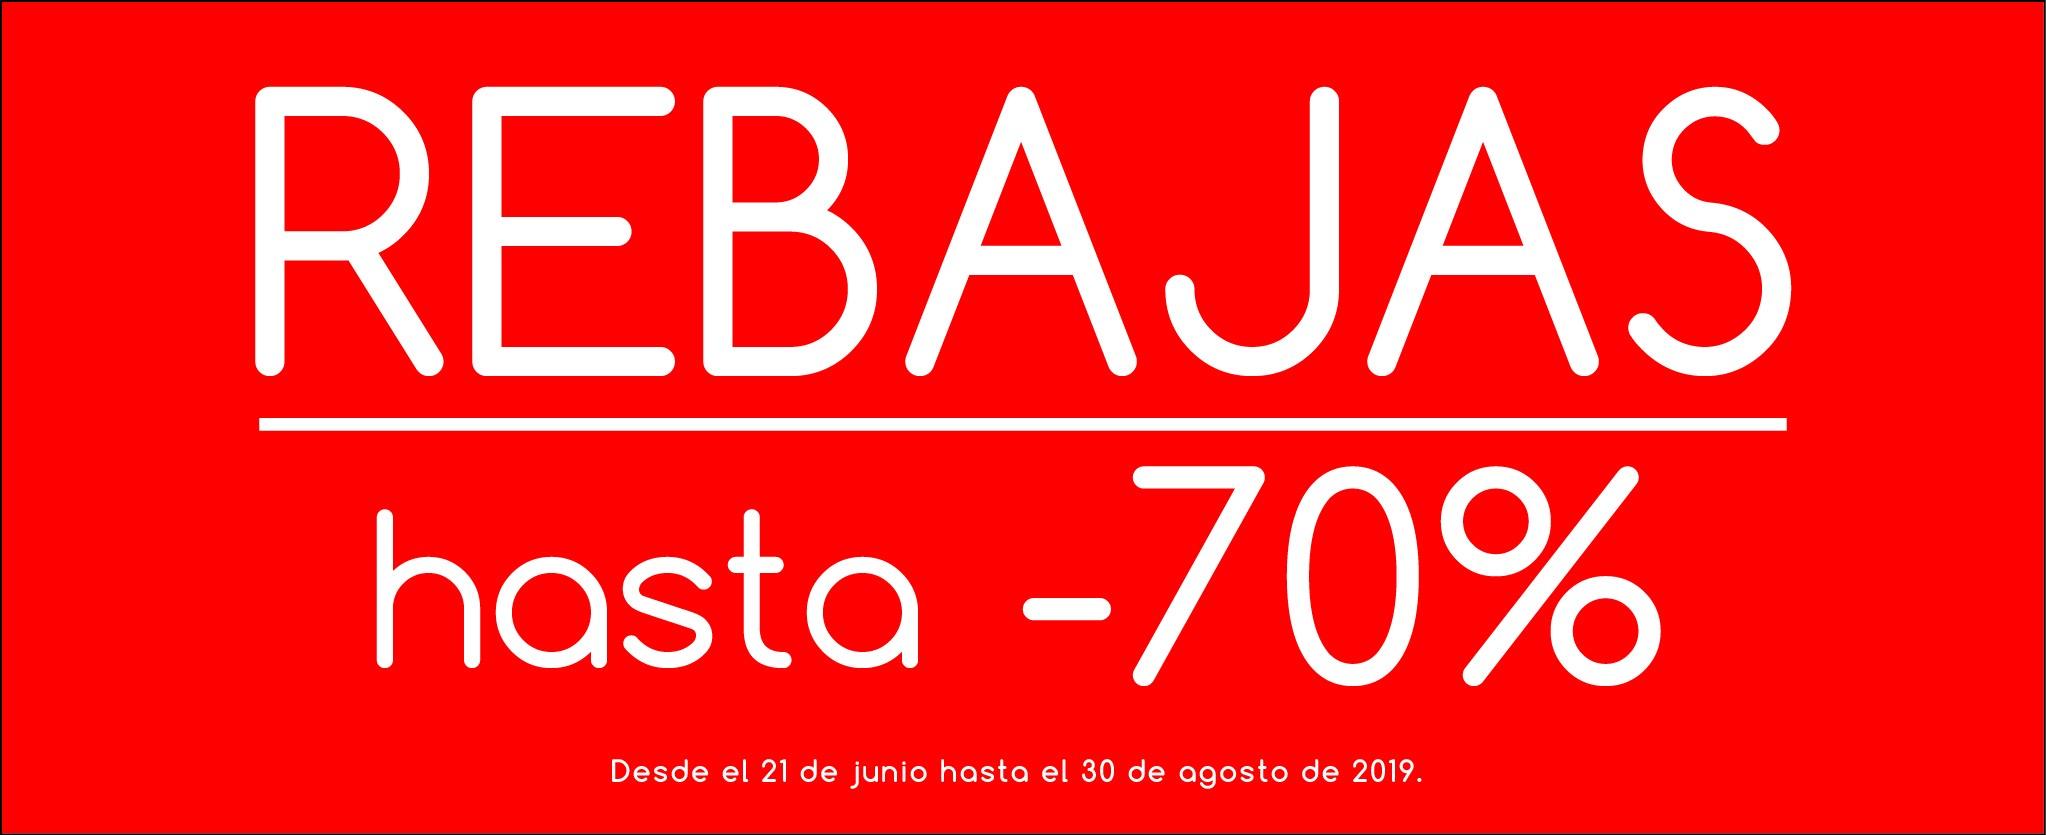 c42d2e1b9 Tienda de Bebes en Madrid y Puericultura - Bebépolis